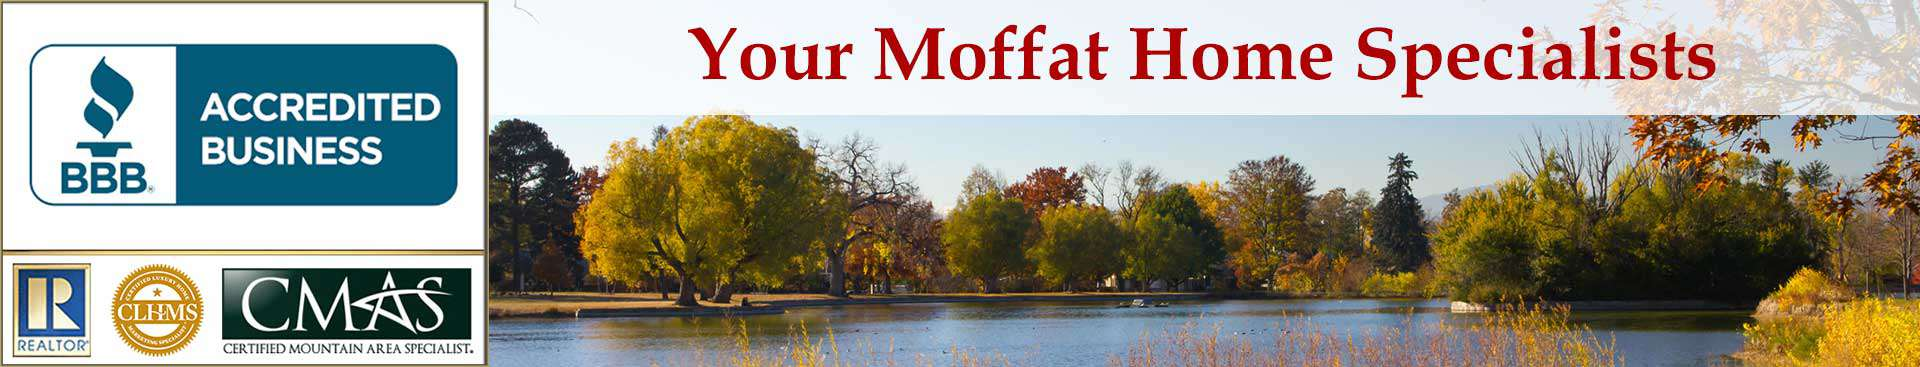 Moffat Accreditations Banner